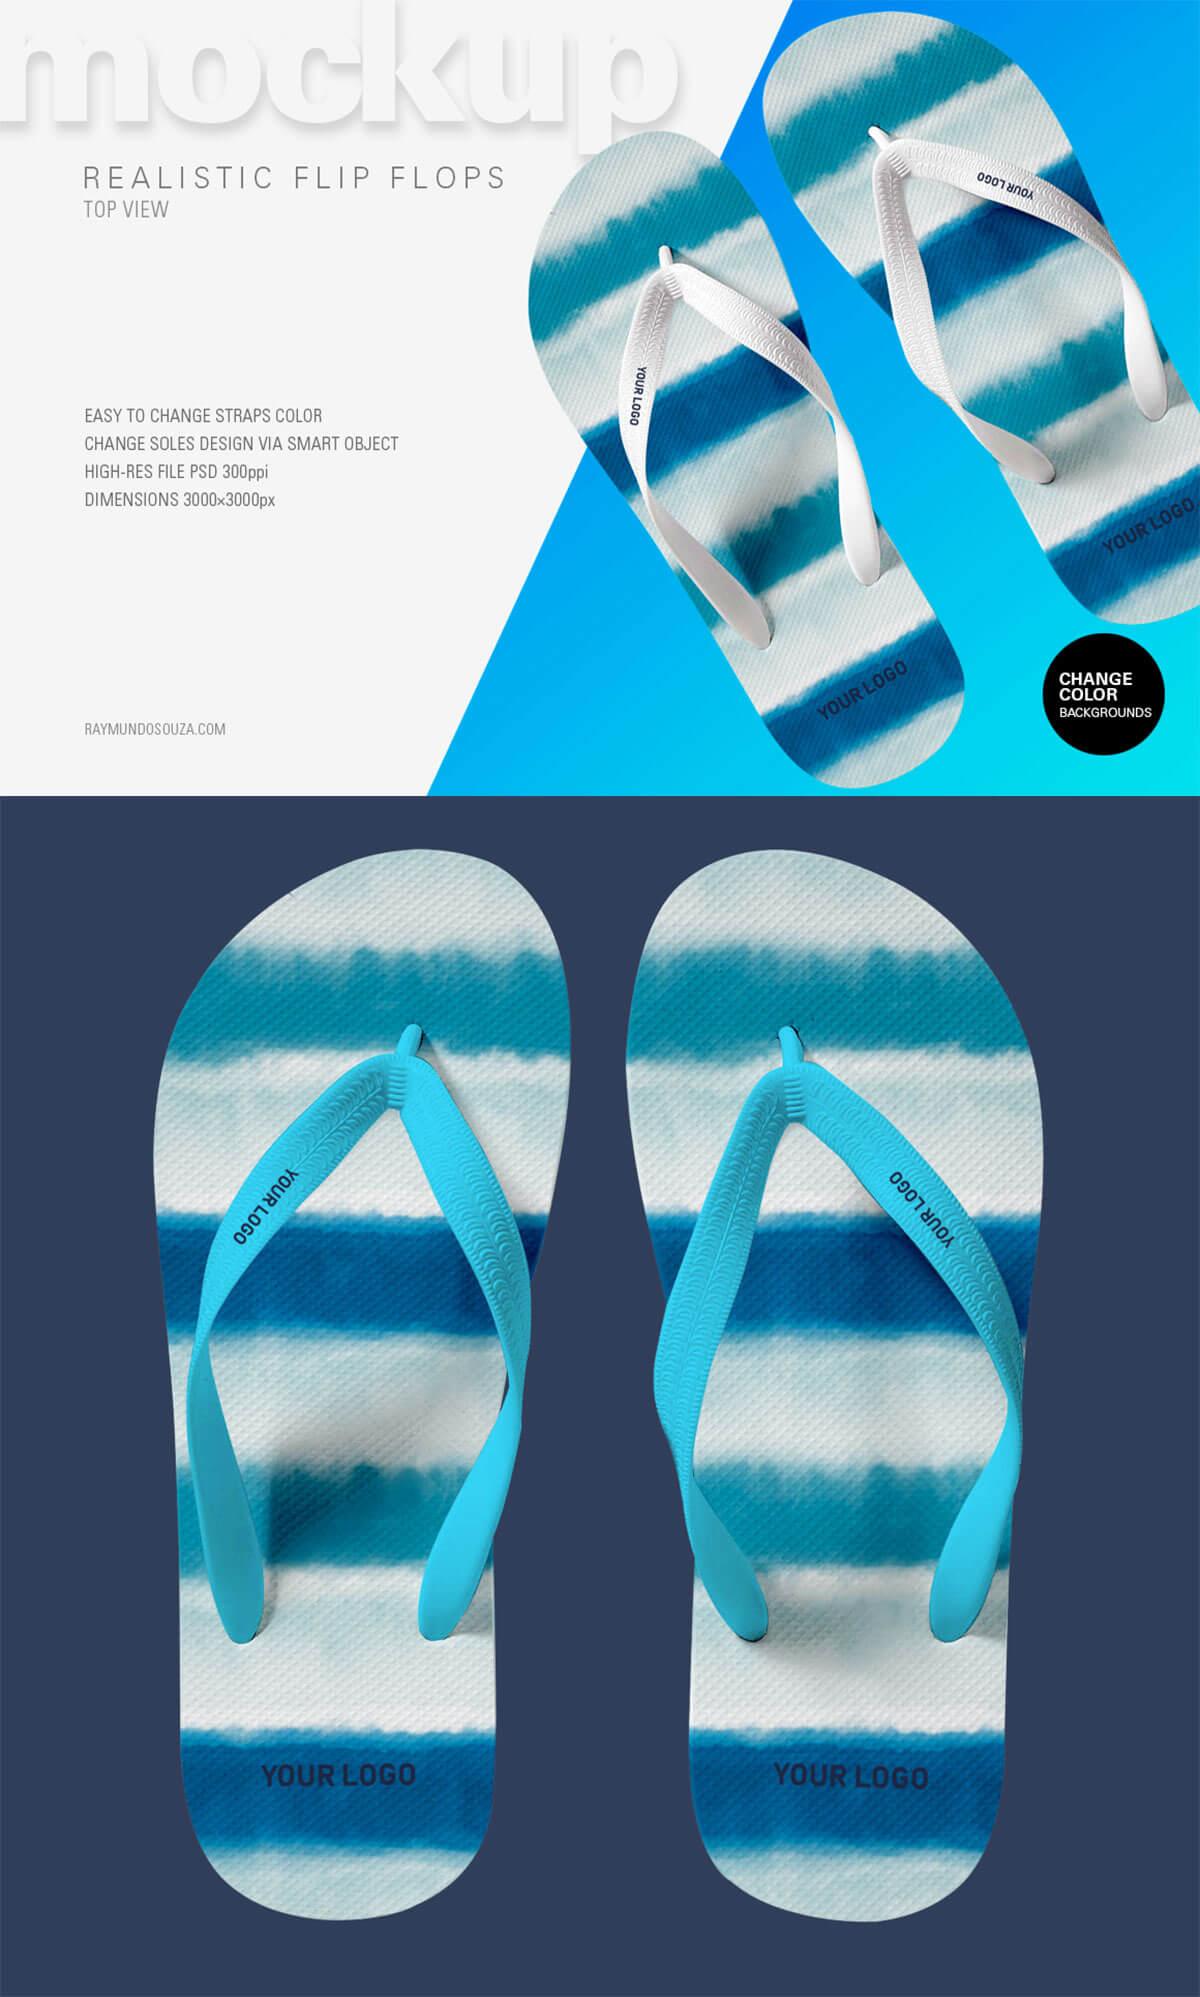 Free Flip Flop Realistic PSD Mockup